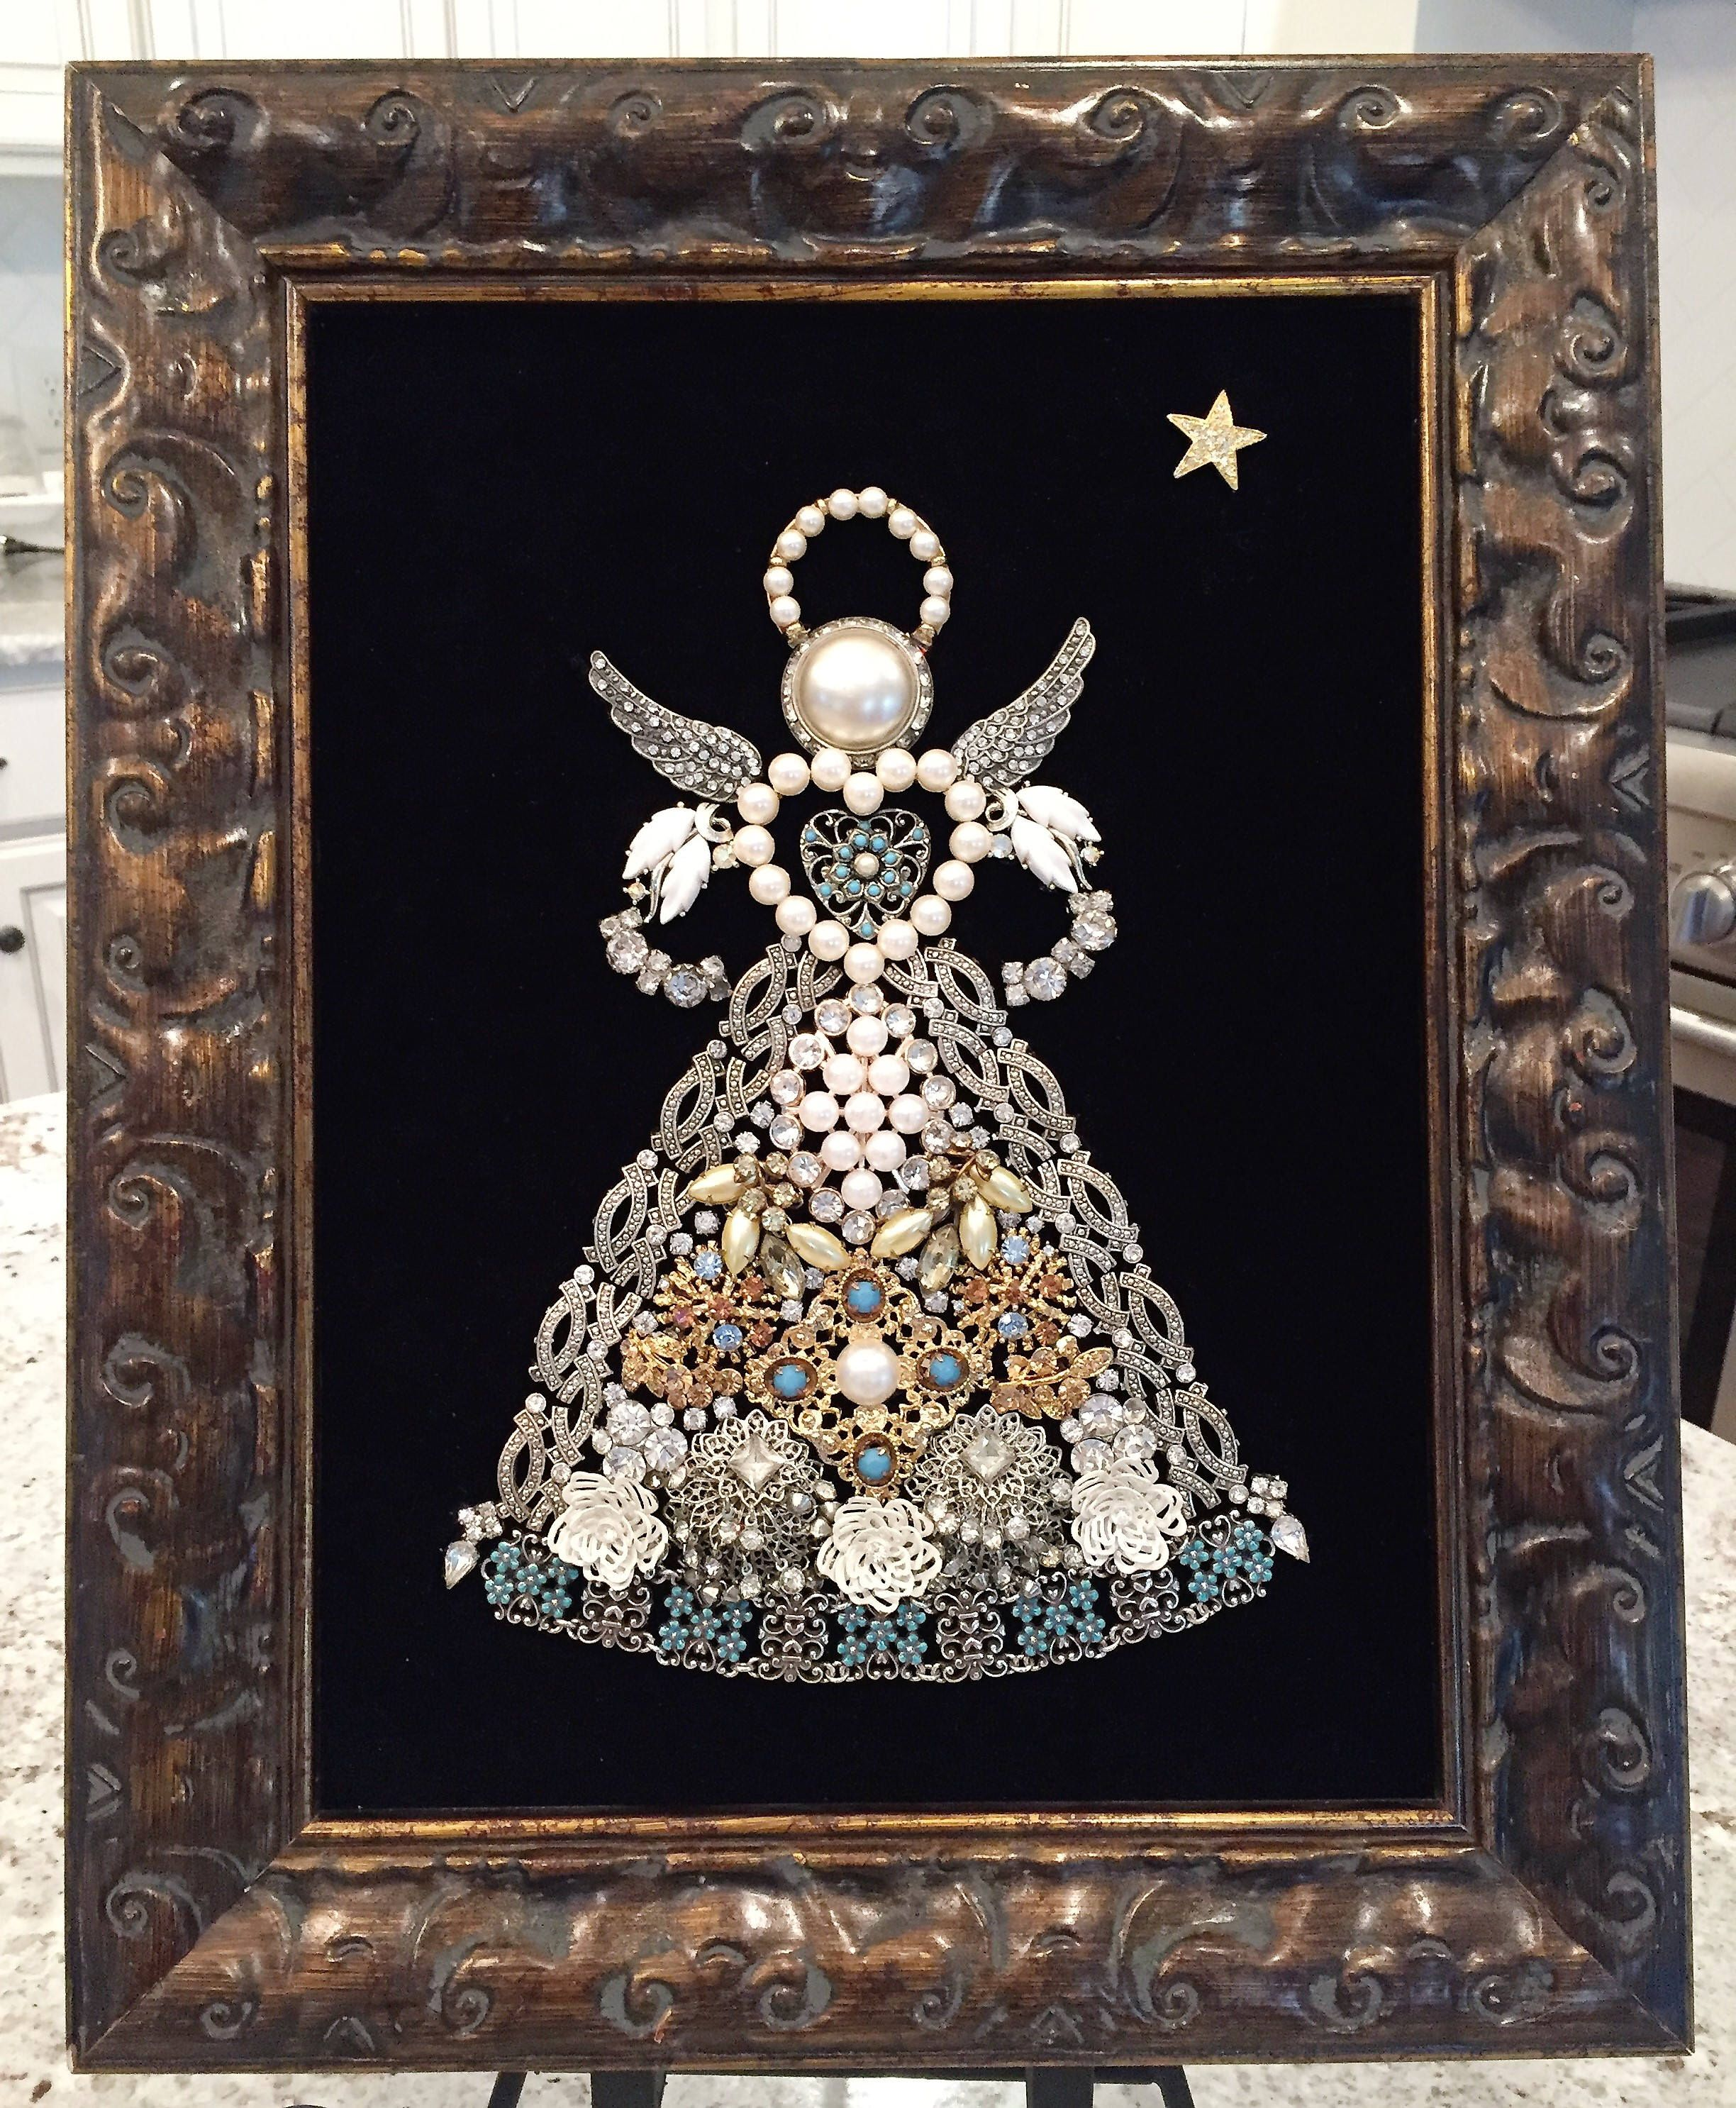 Costume Vintage Jewelry Framed Art Of An Angel Jewelry Frames Vintage Jewelry Crafts Vintage Jewelry Ideas